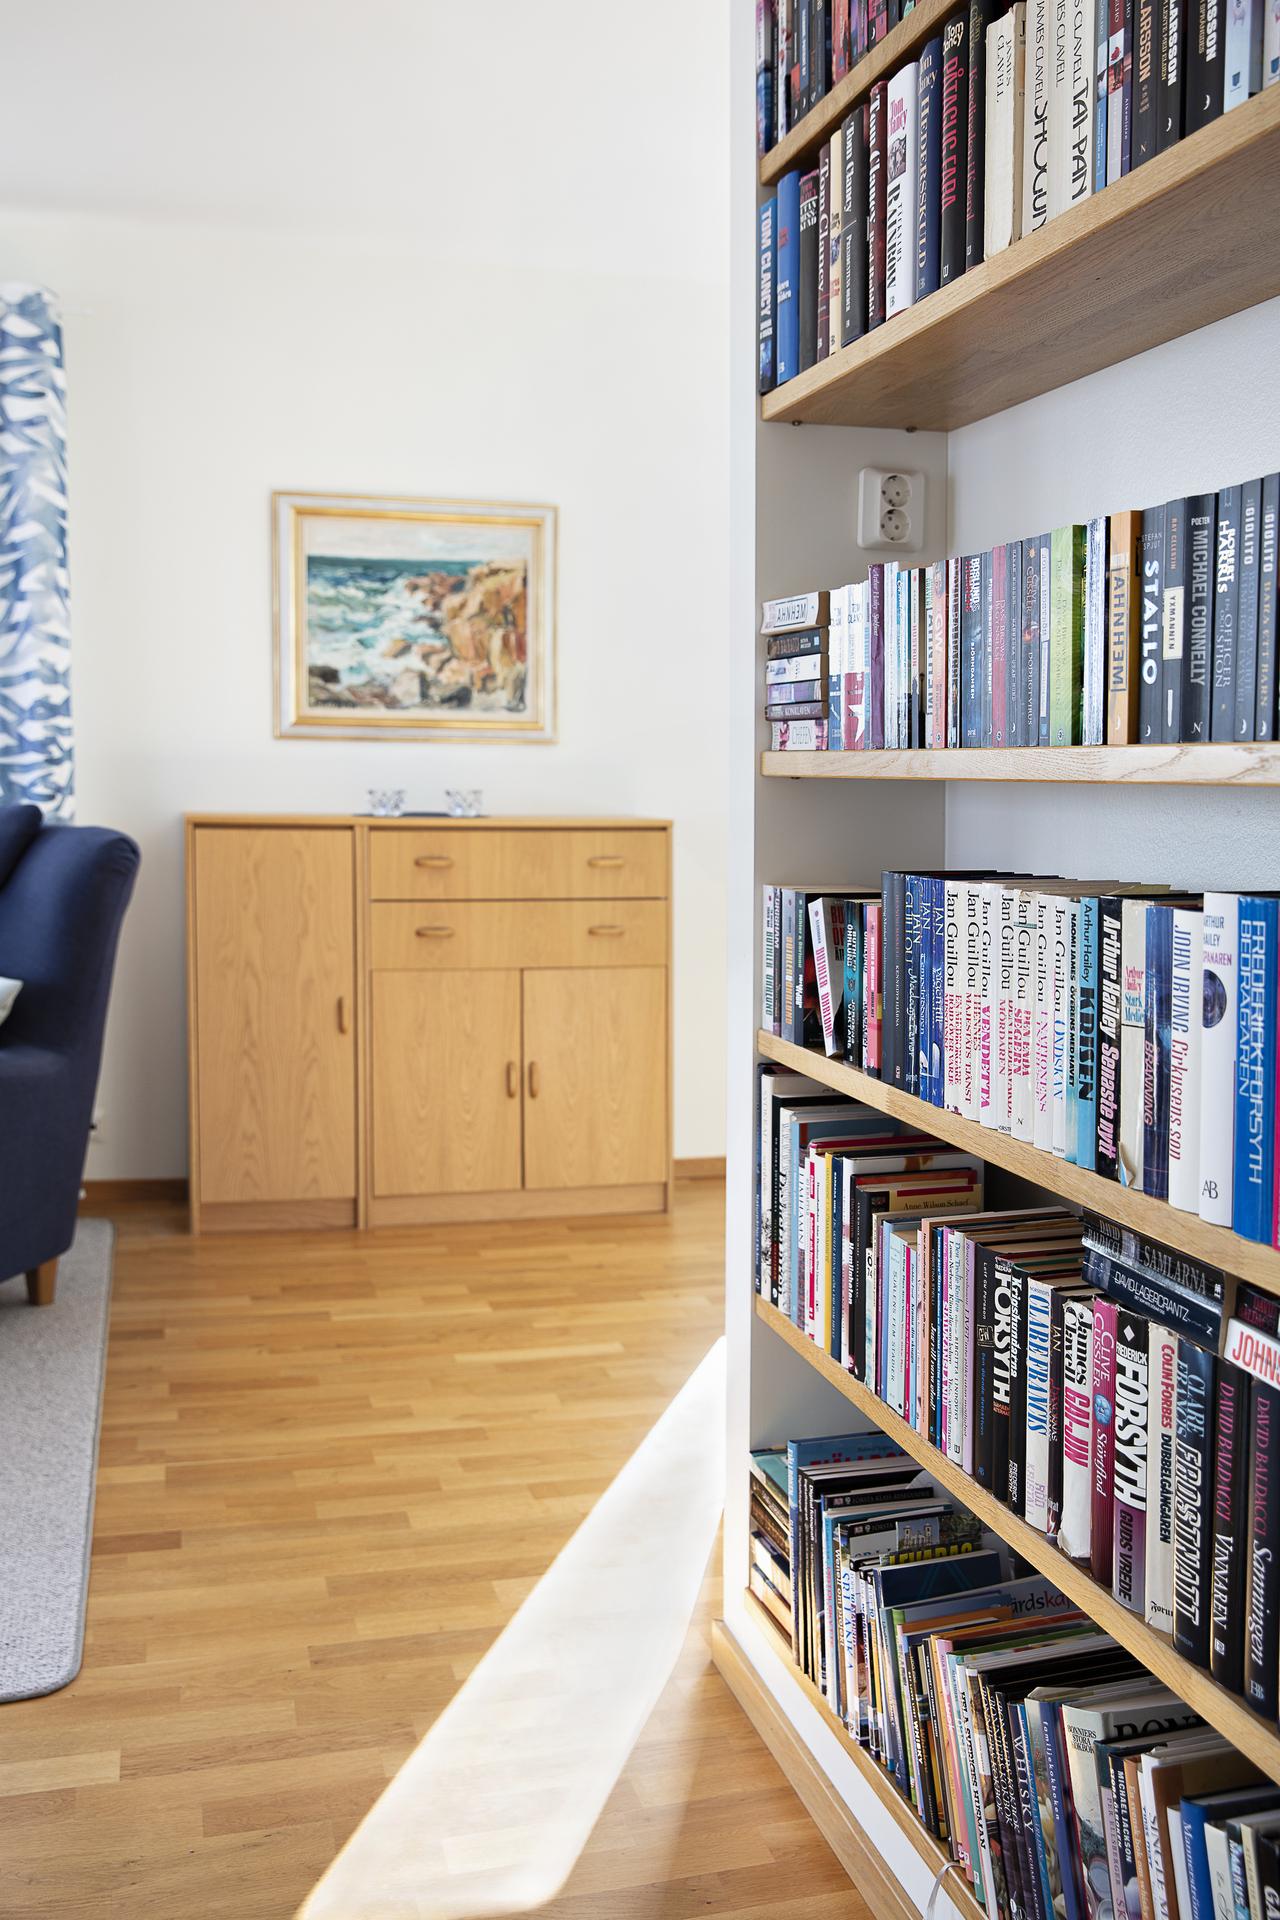 Detaljbild - platsbyggd bokhylla